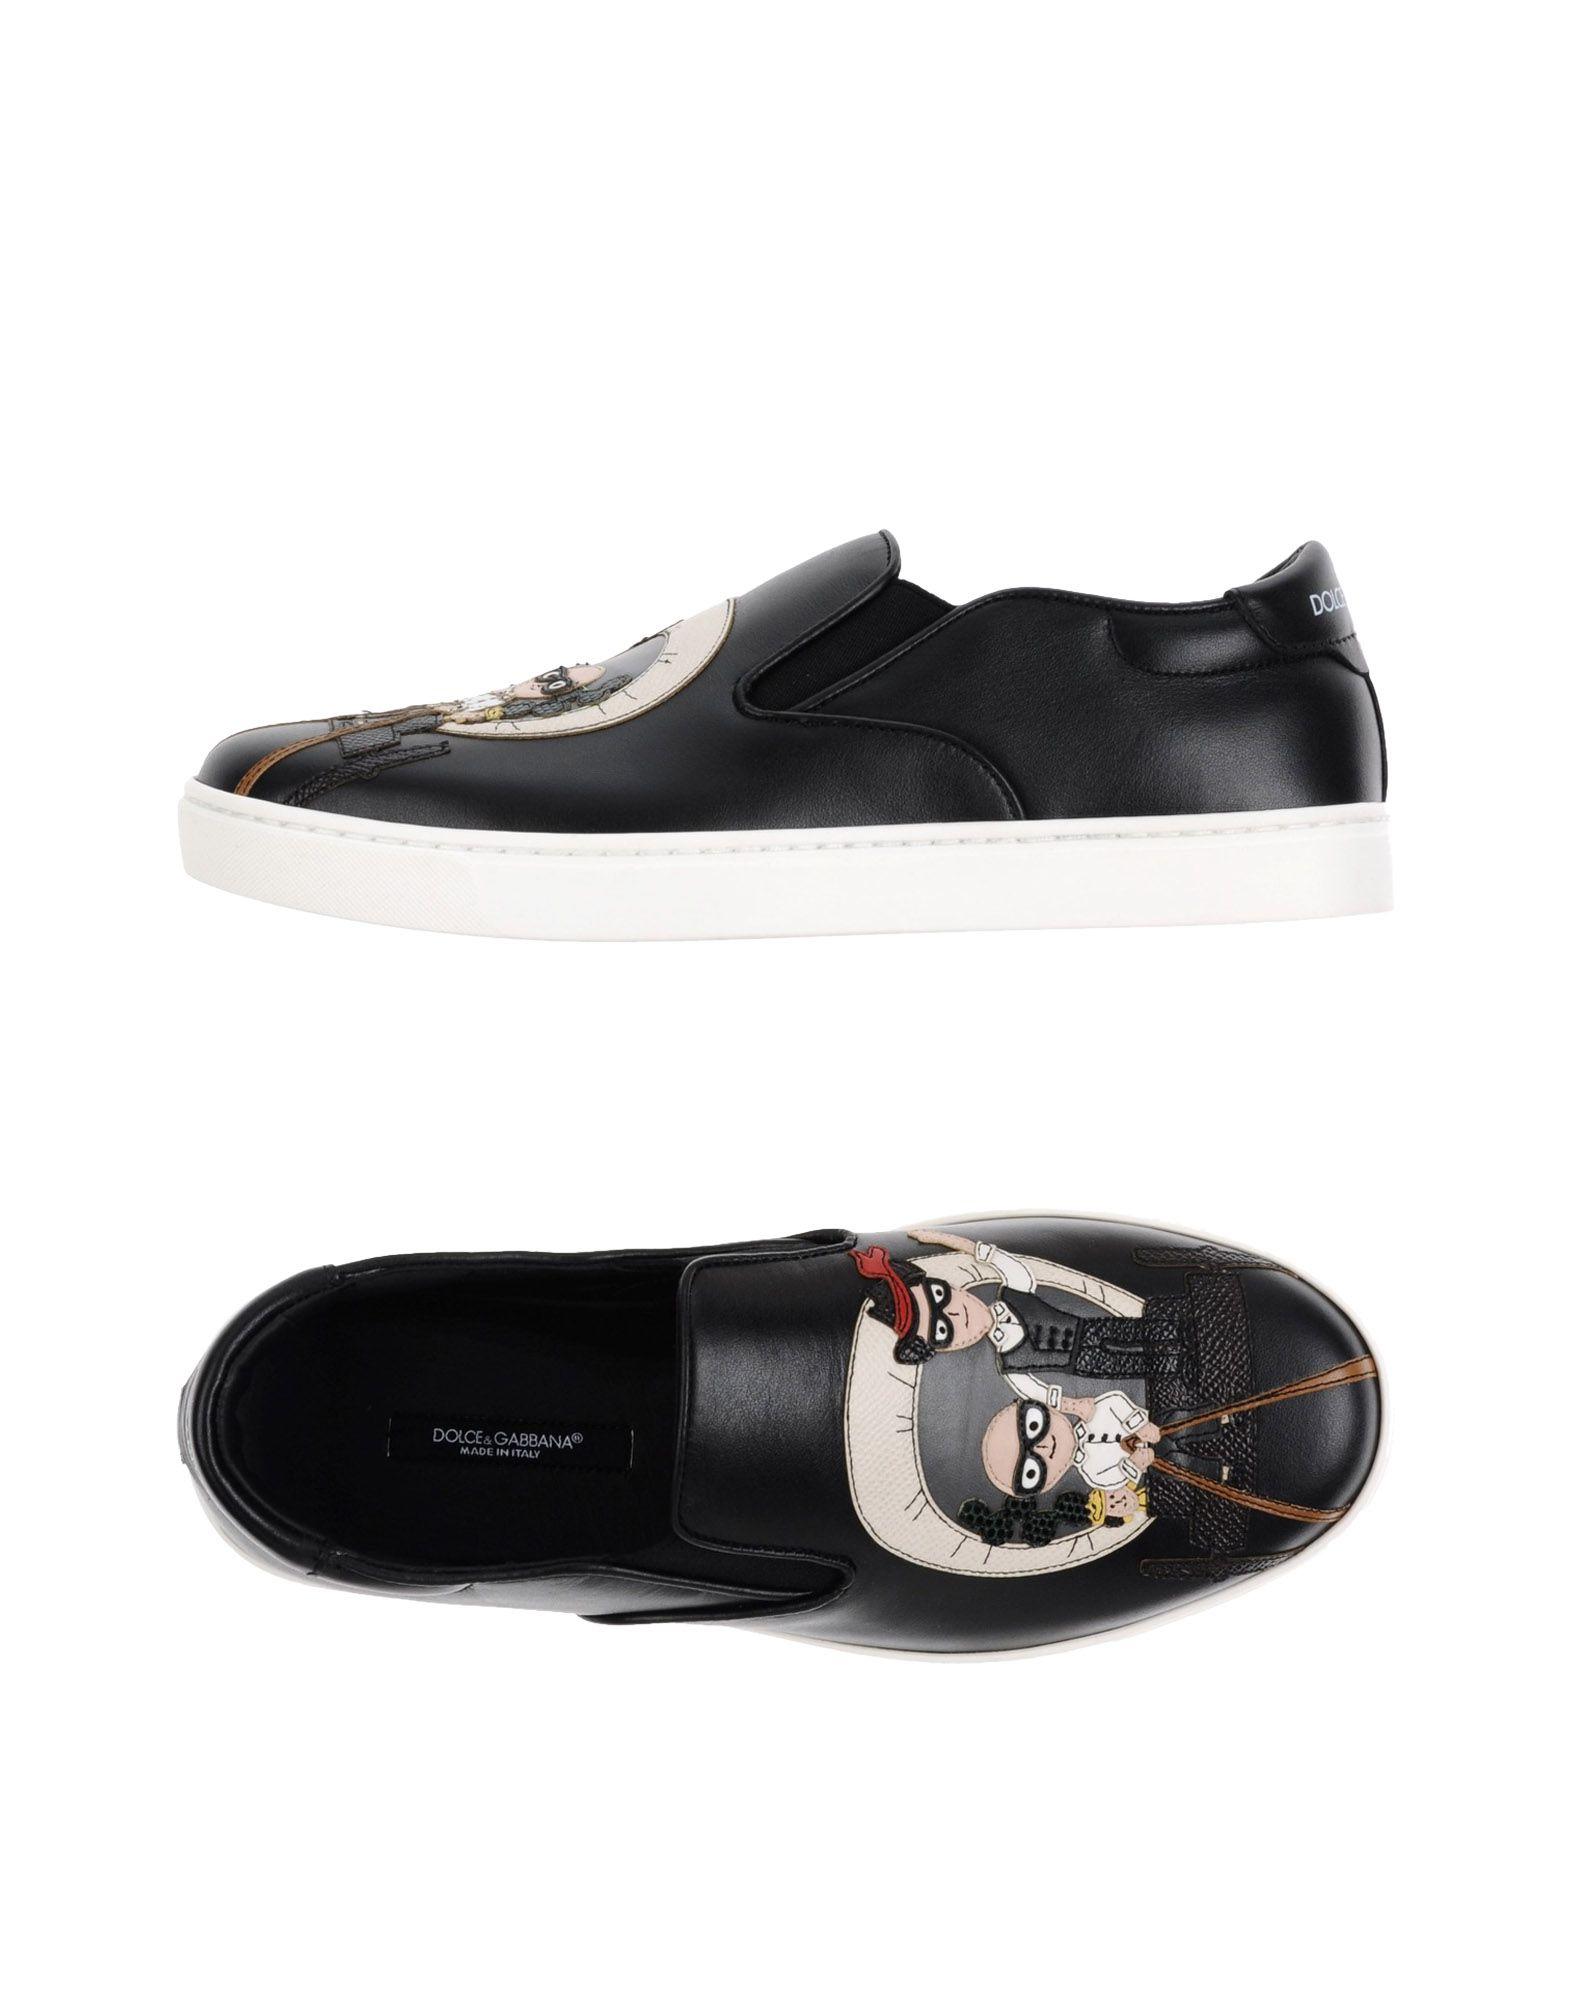 Dolce & Gabbana Sneakers Herren  11269791ND Gute Qualität beliebte Schuhe